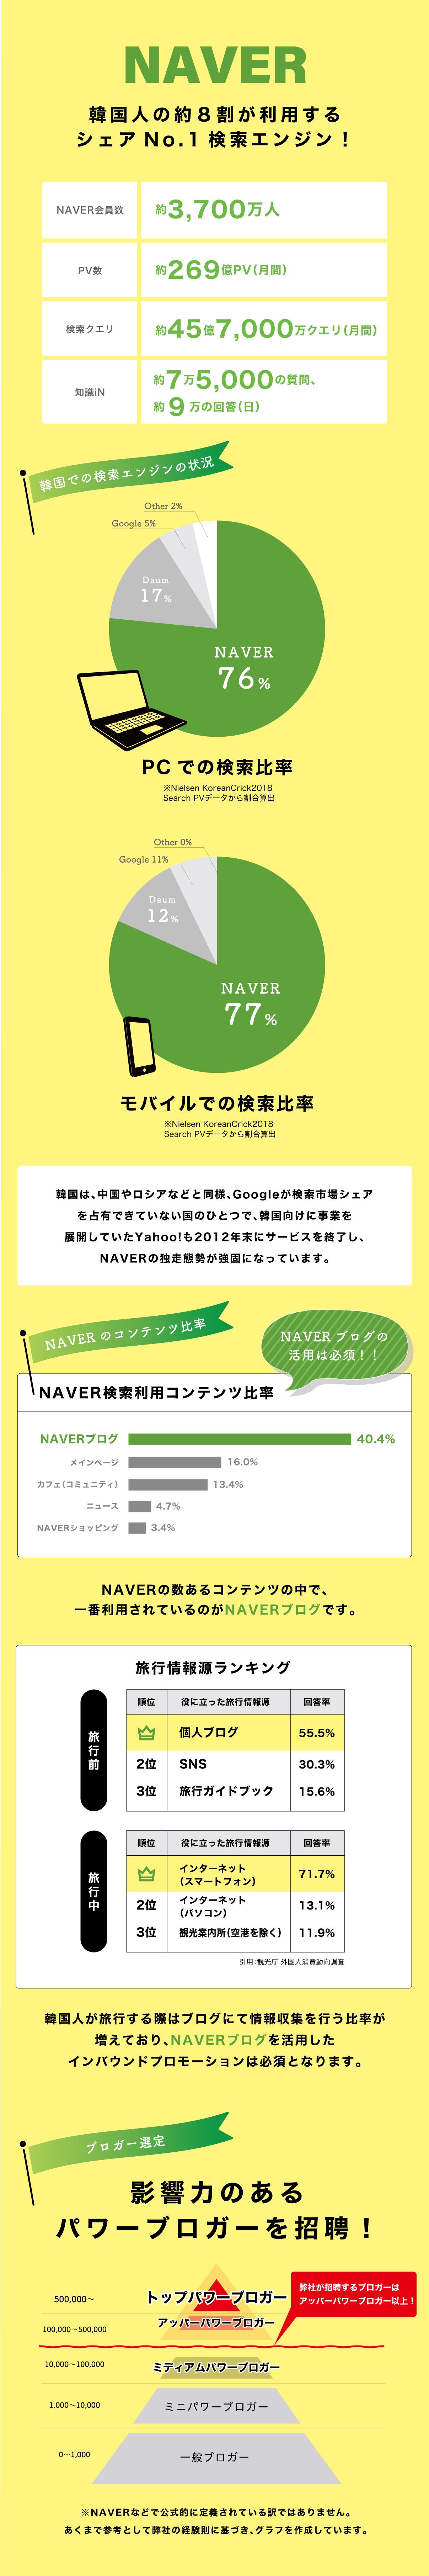 NAVER 韓国人の約8割が利用するシェアNo.1検索エンジン!